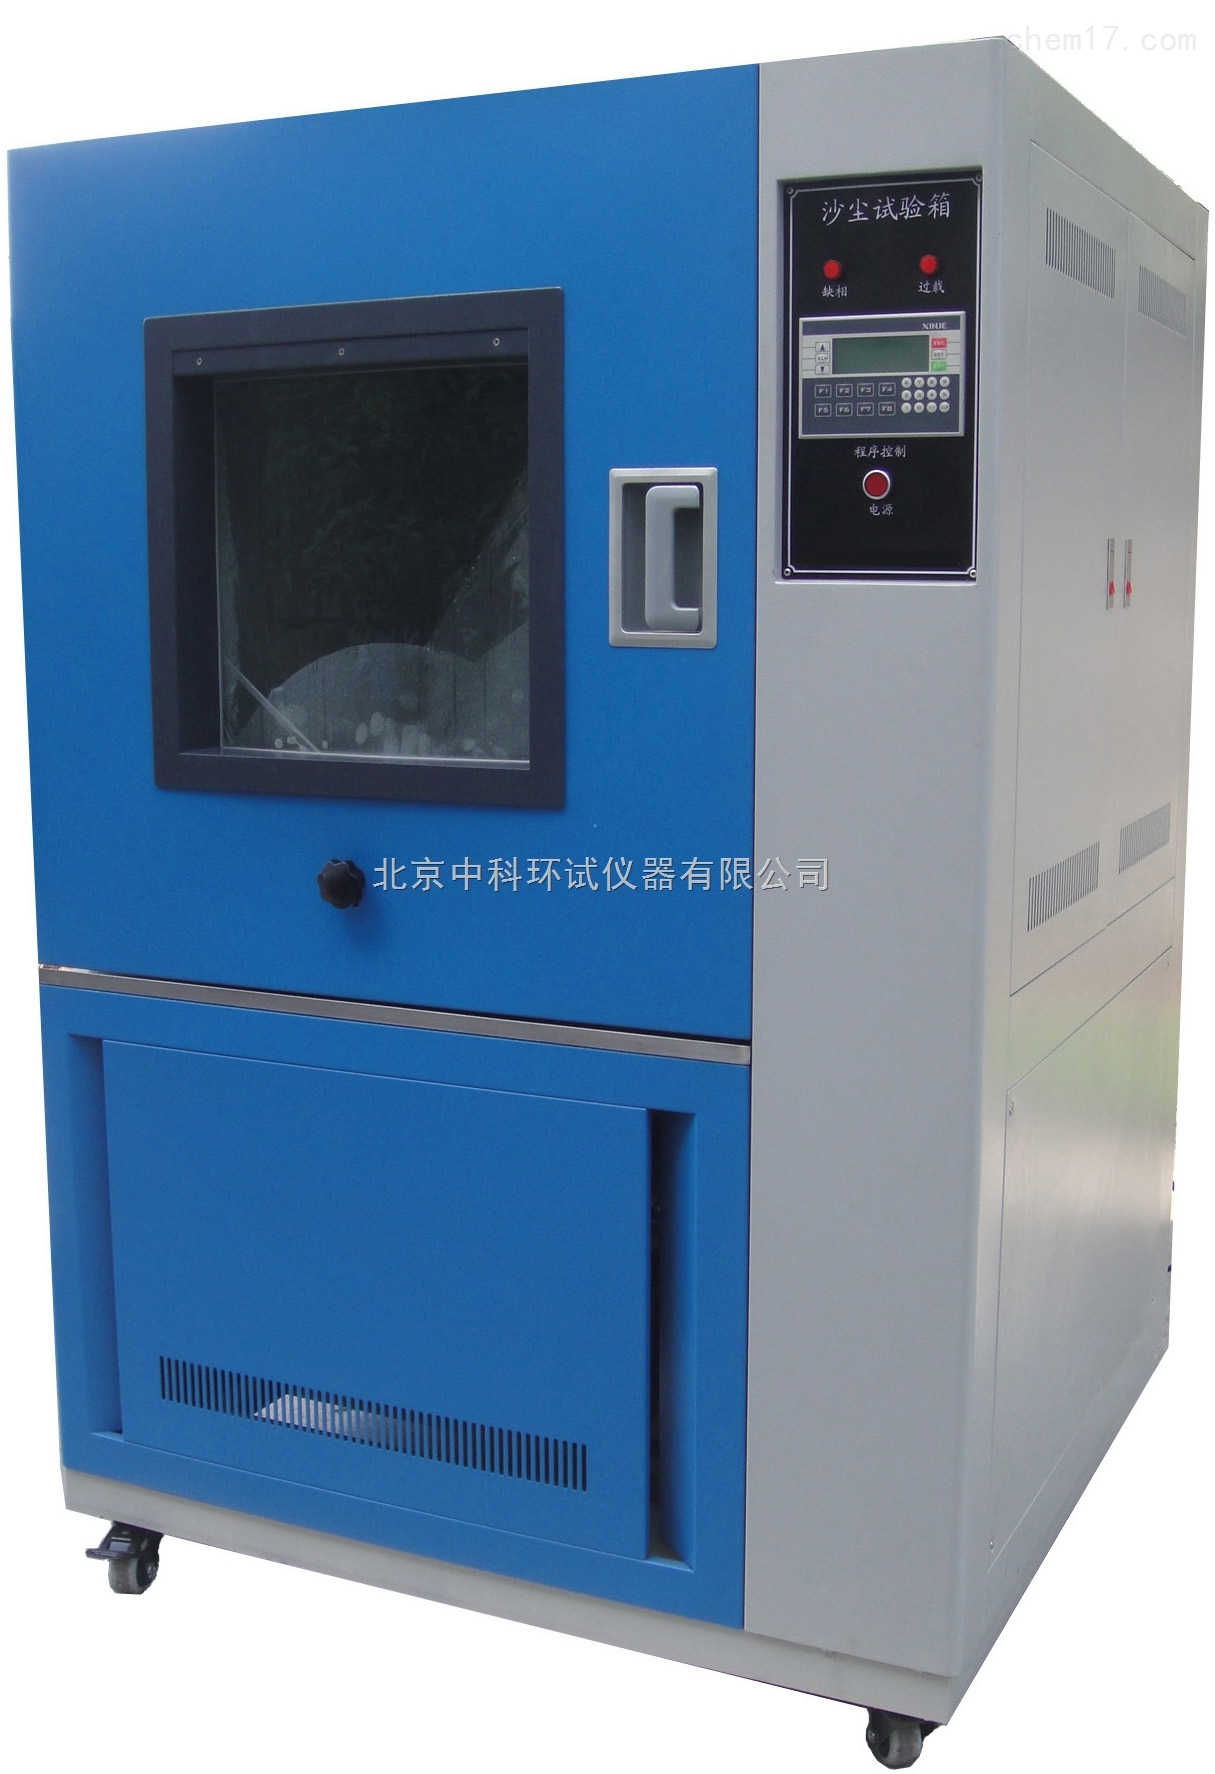 SC-015粉尘测试箱/沙尘试验箱